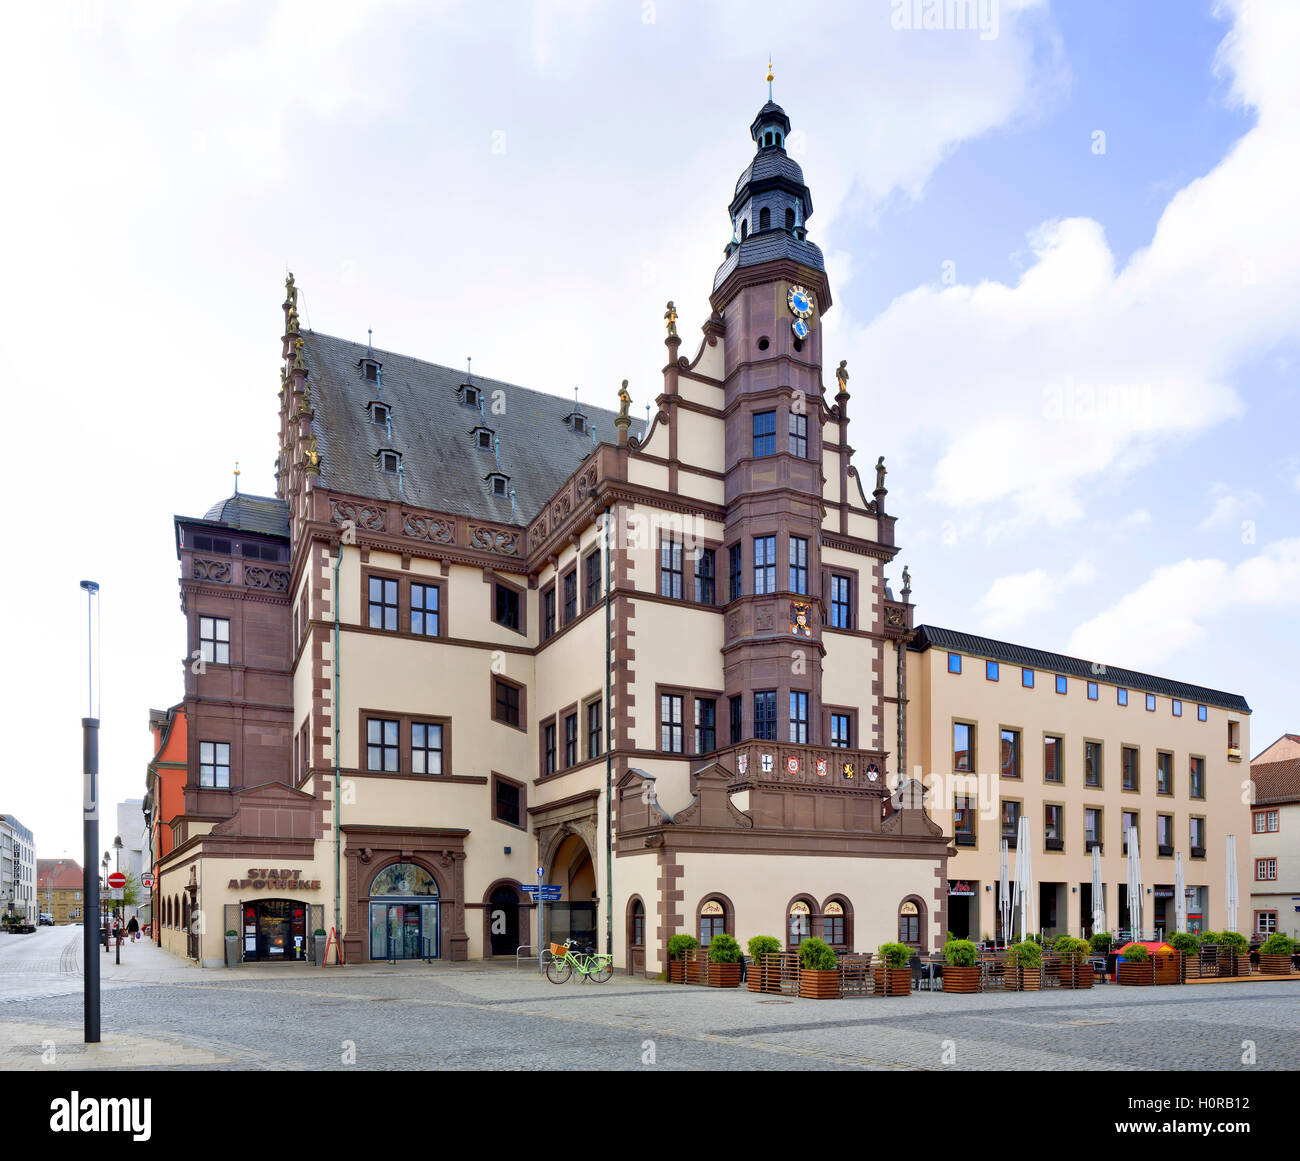 Rb Schweinfurt